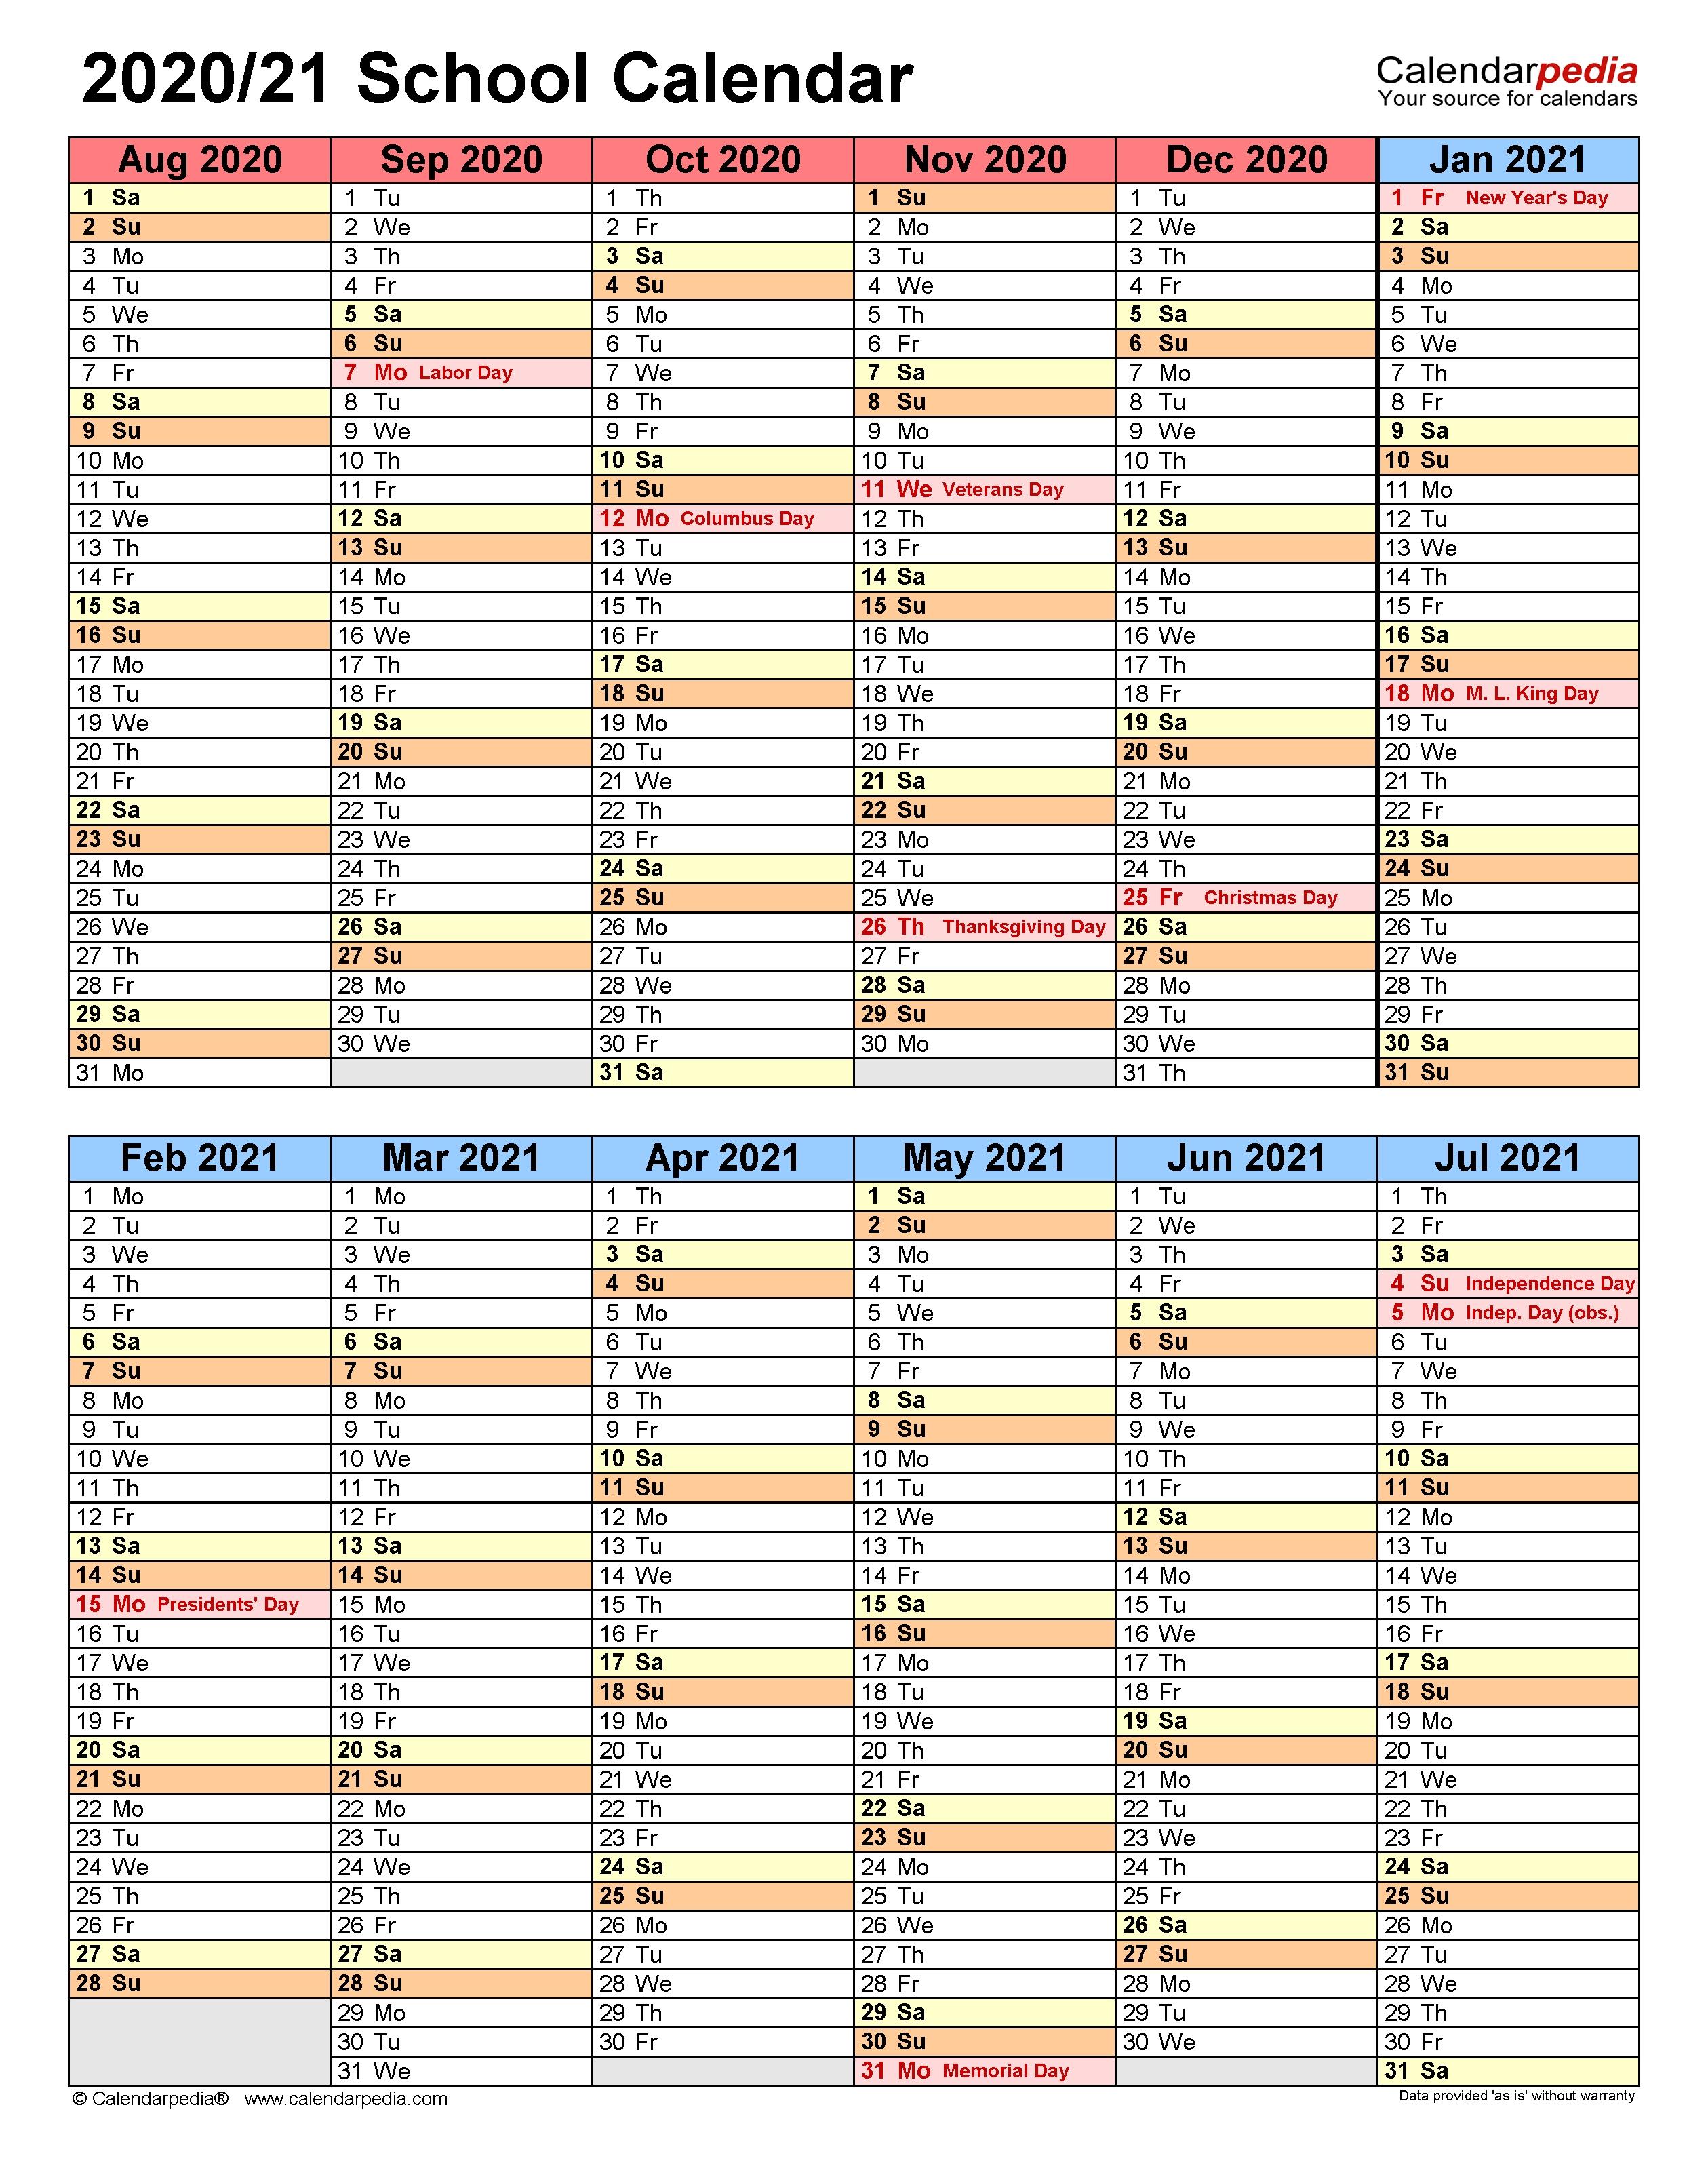 School Calendars 2020/2021 - Free Printable Word Templates-School Year Calendar 2020-20 Template